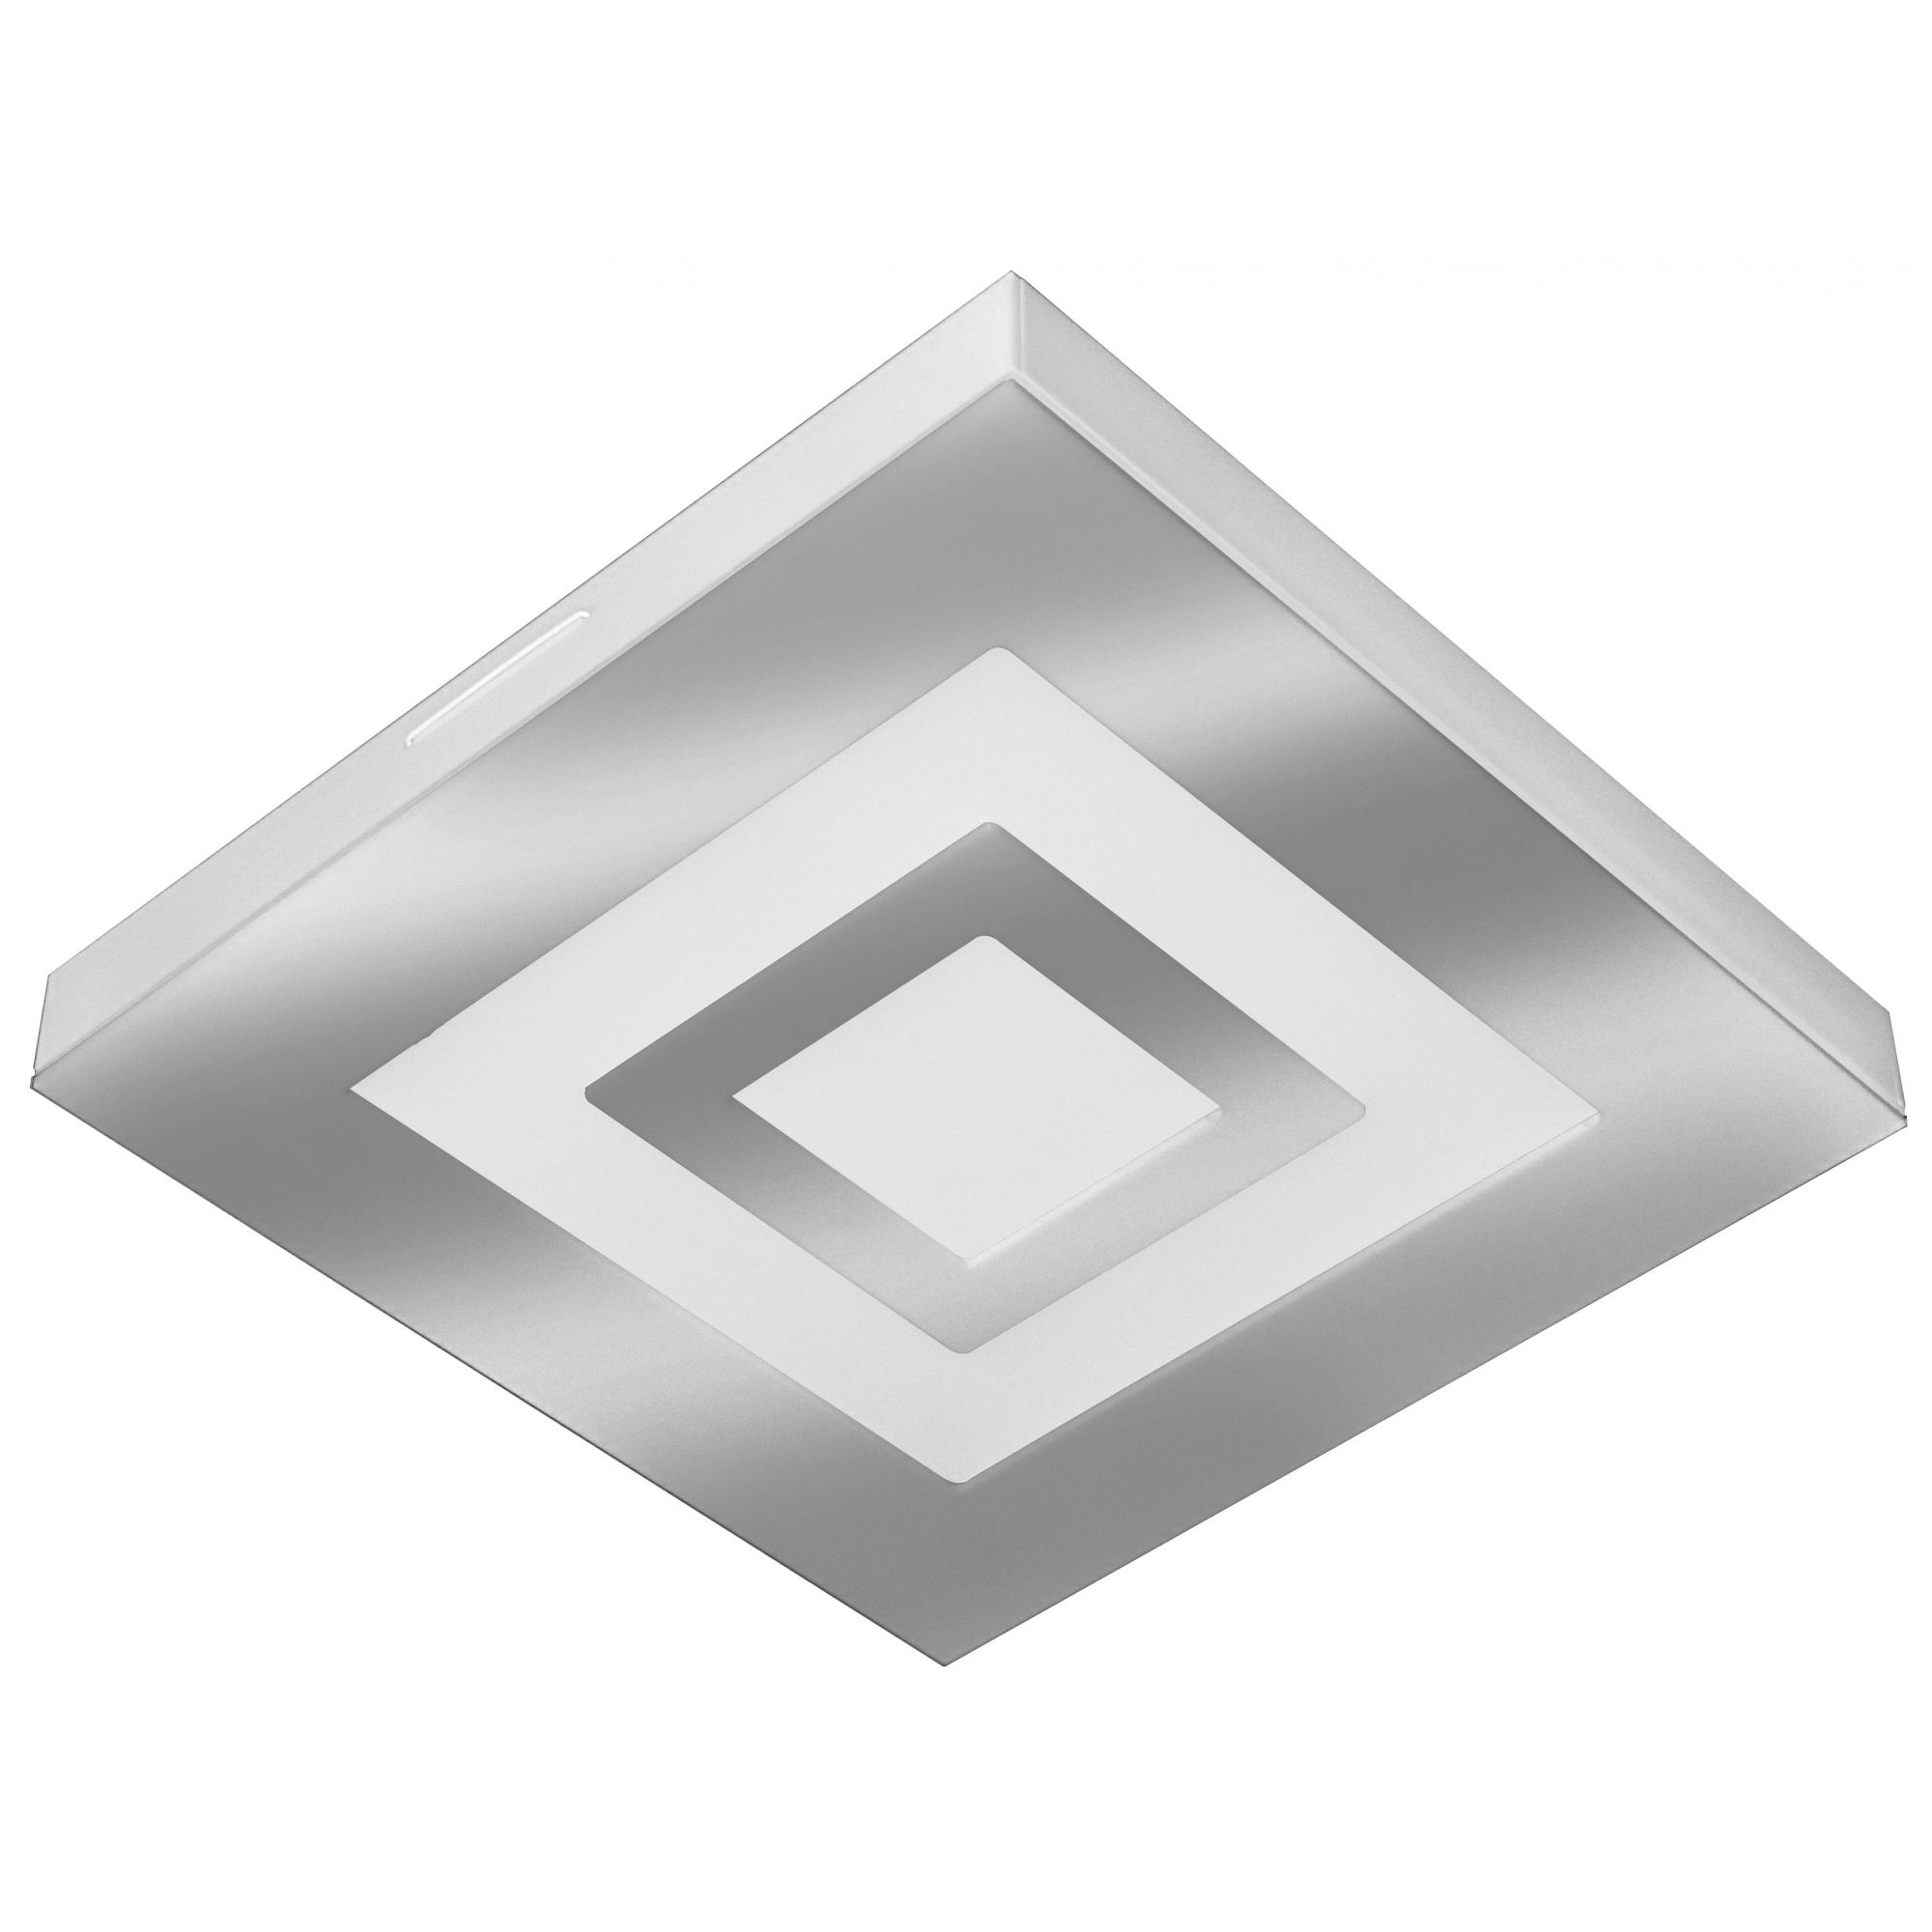 PLAFON LED ROMA 16W 6500W ESPELHADO - TUALUX